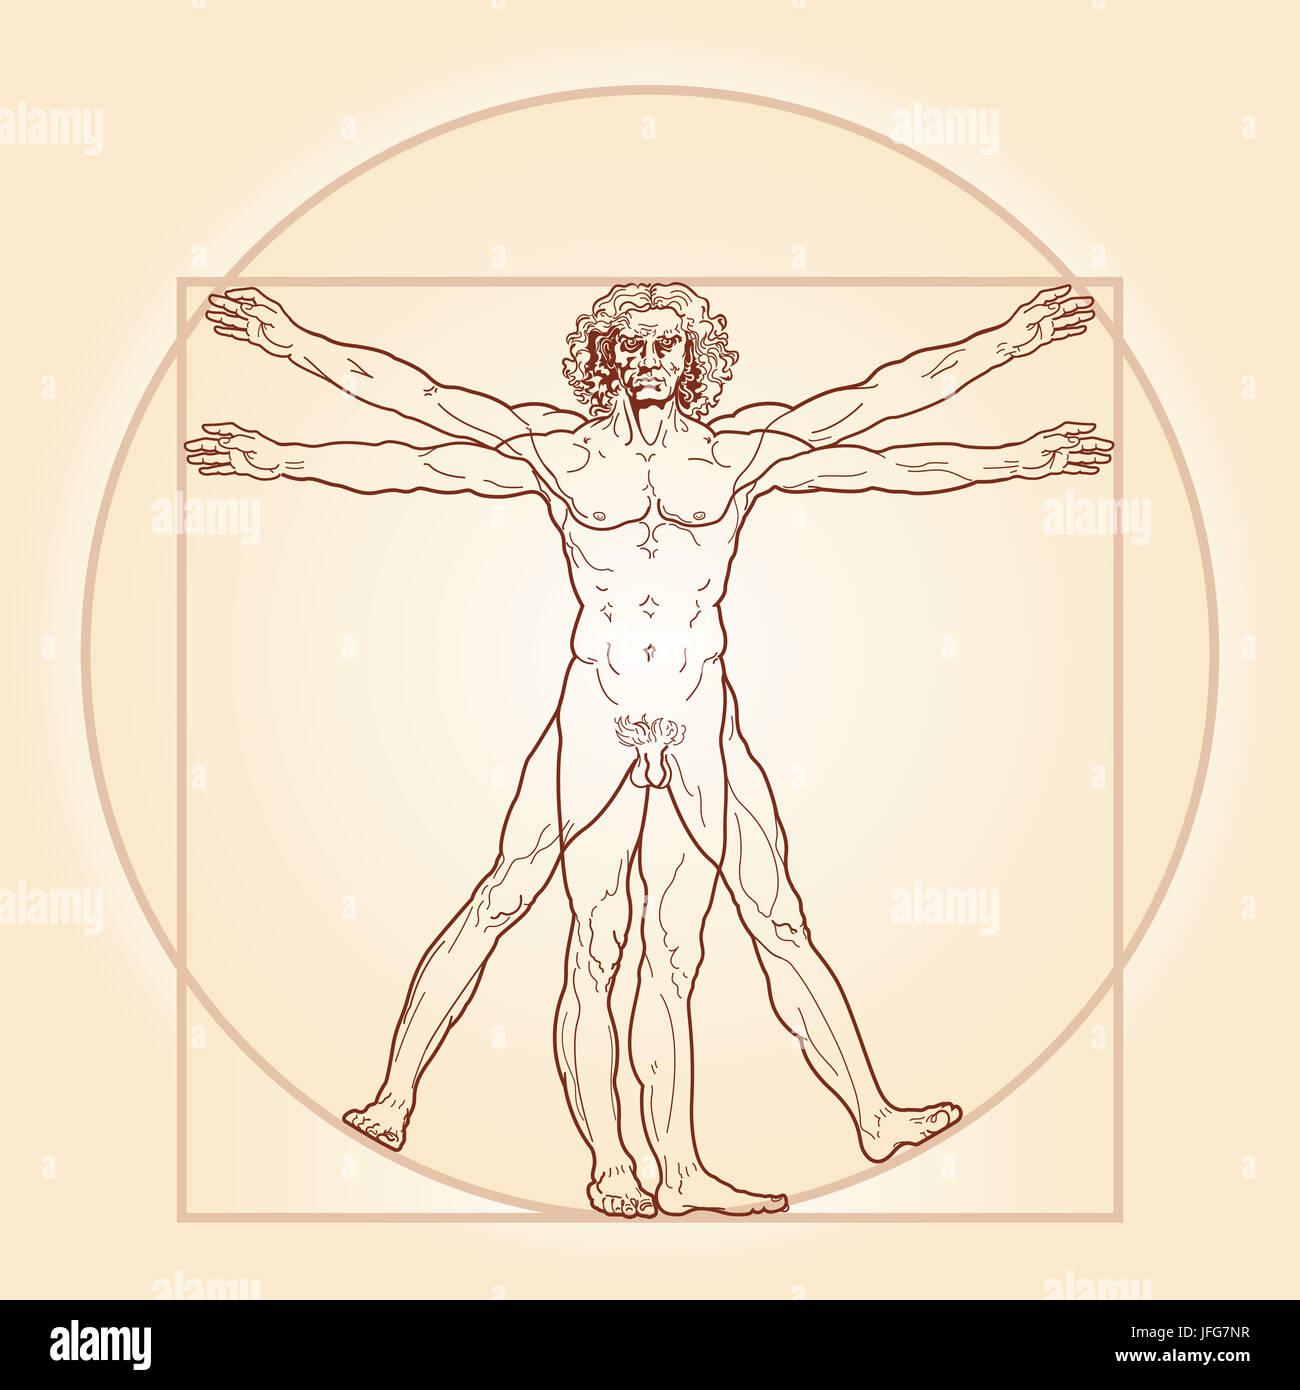 Vitruvian Man Drawing Stockfotos & Vitruvian Man Drawing Bilder - Alamy